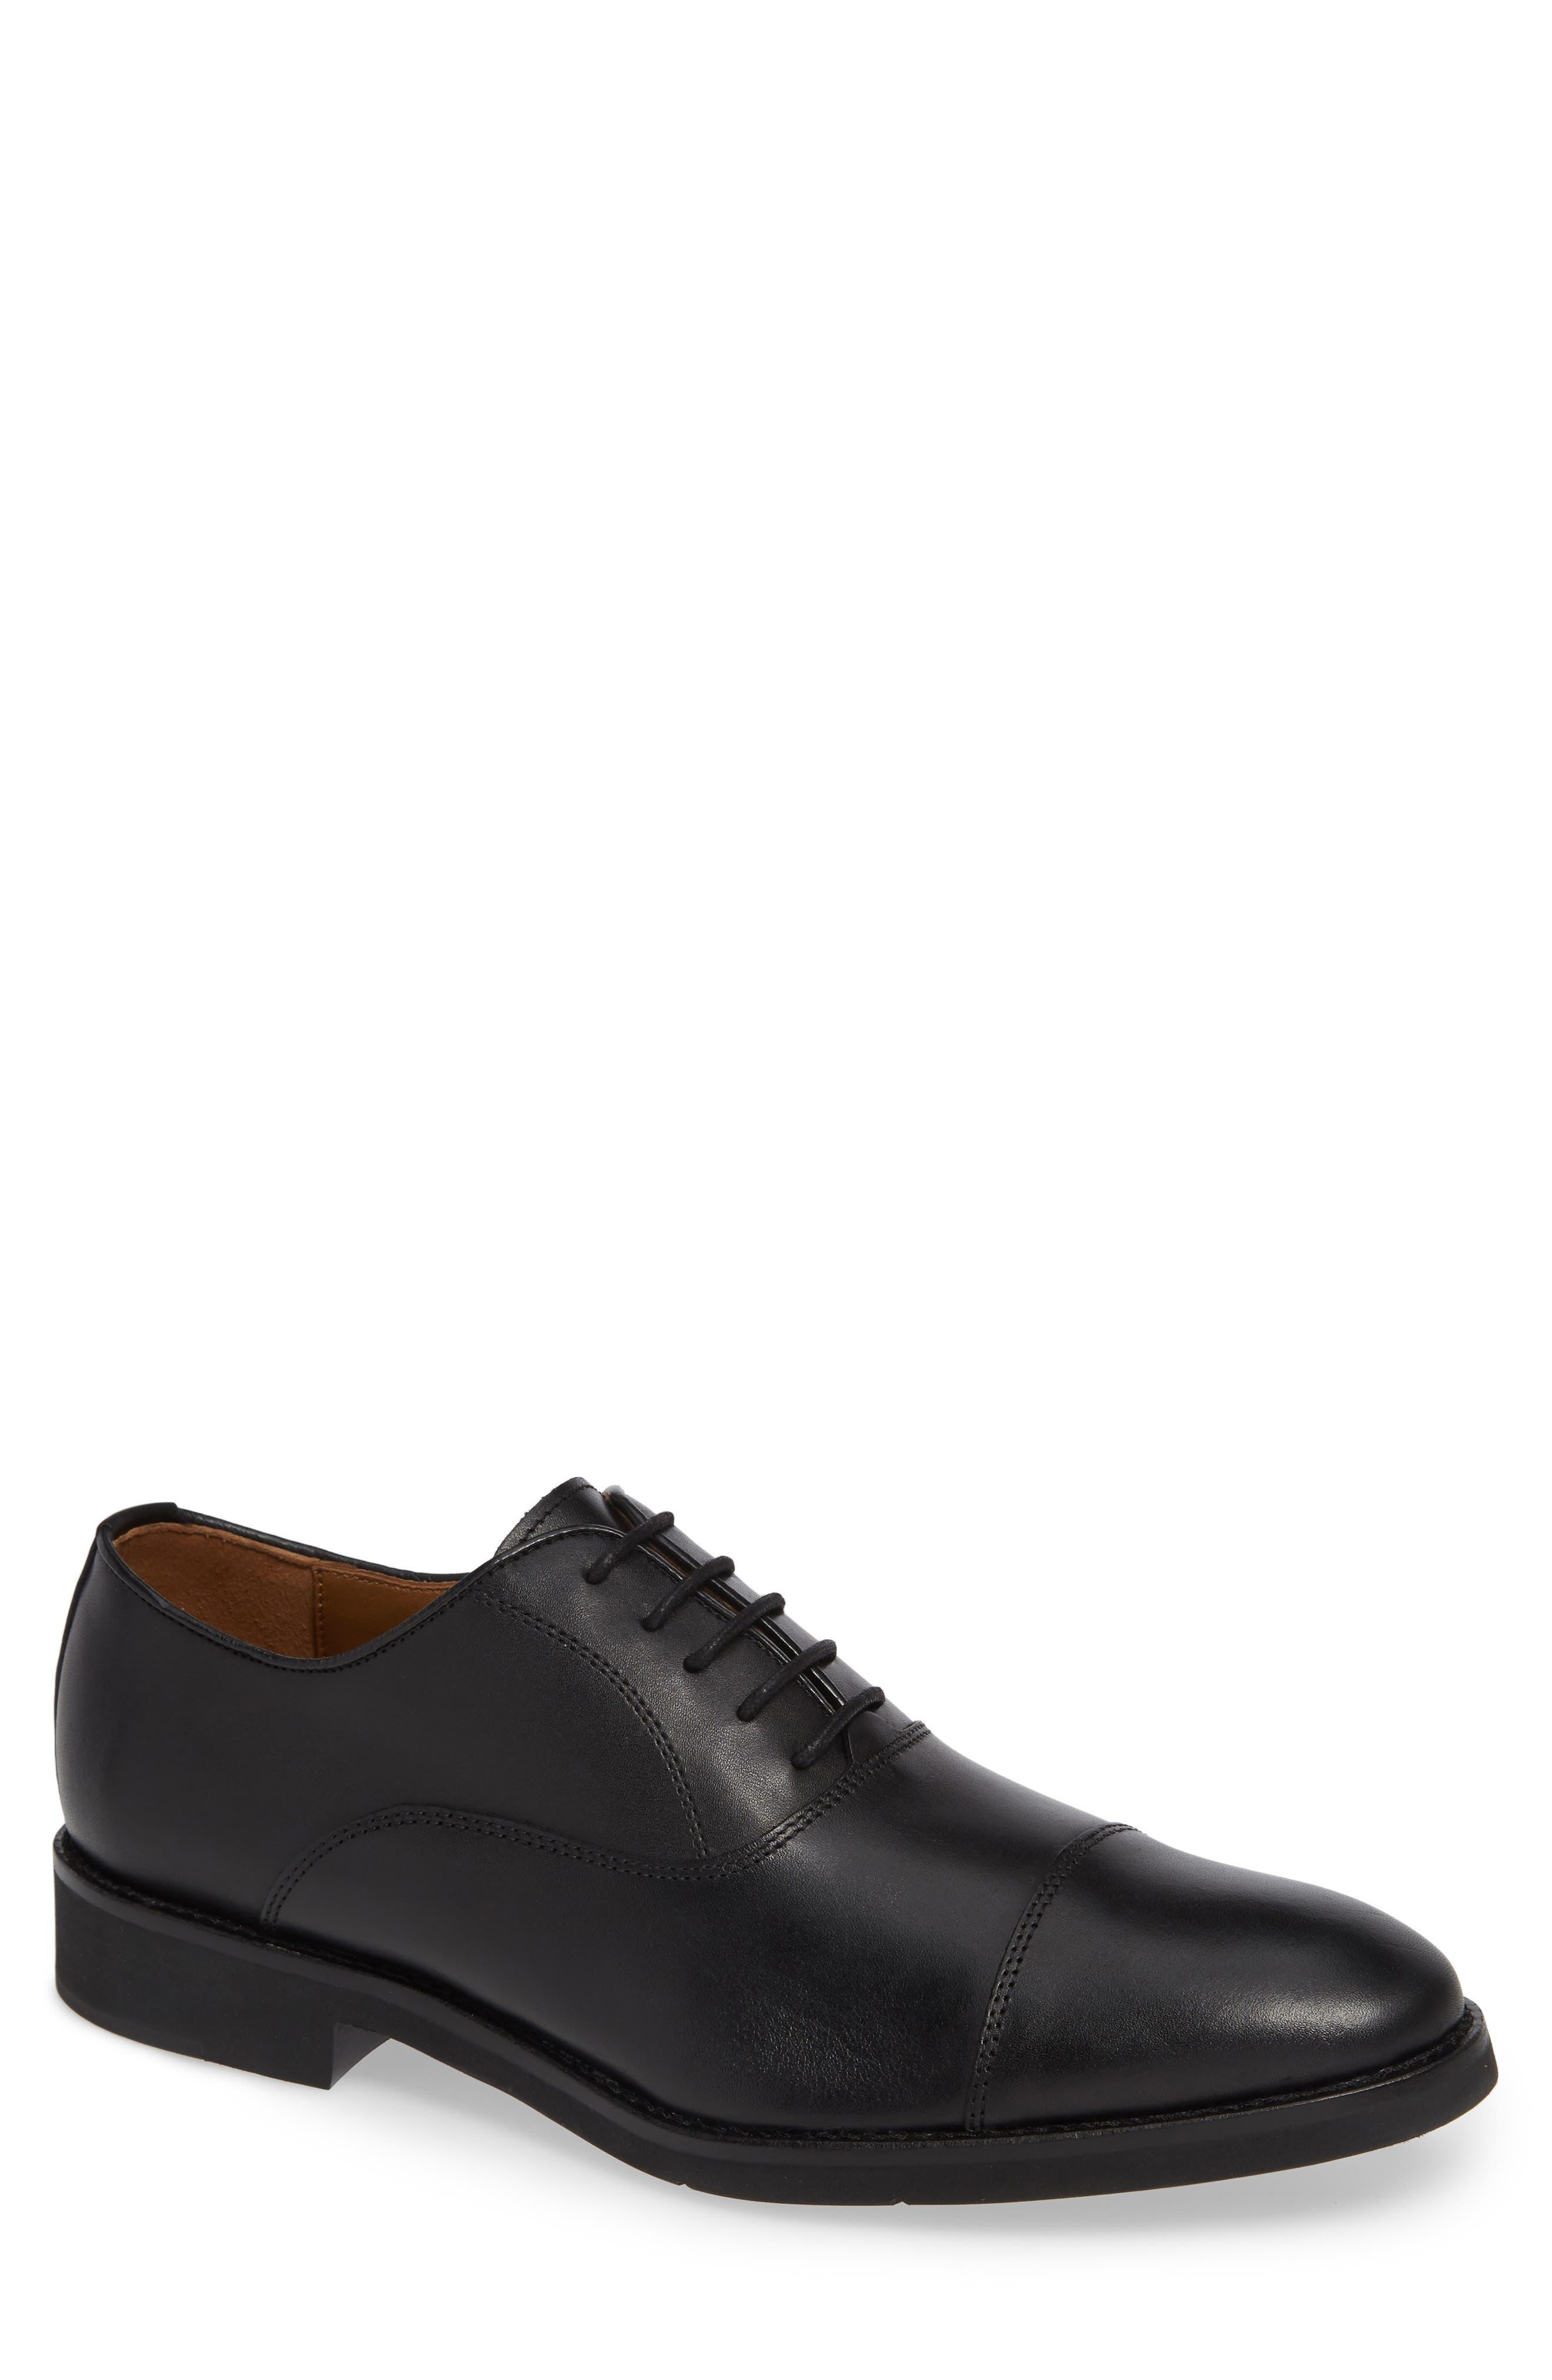 Carlson Cap Toe Oxford,                         Main,                         color, BLACK LEATHER